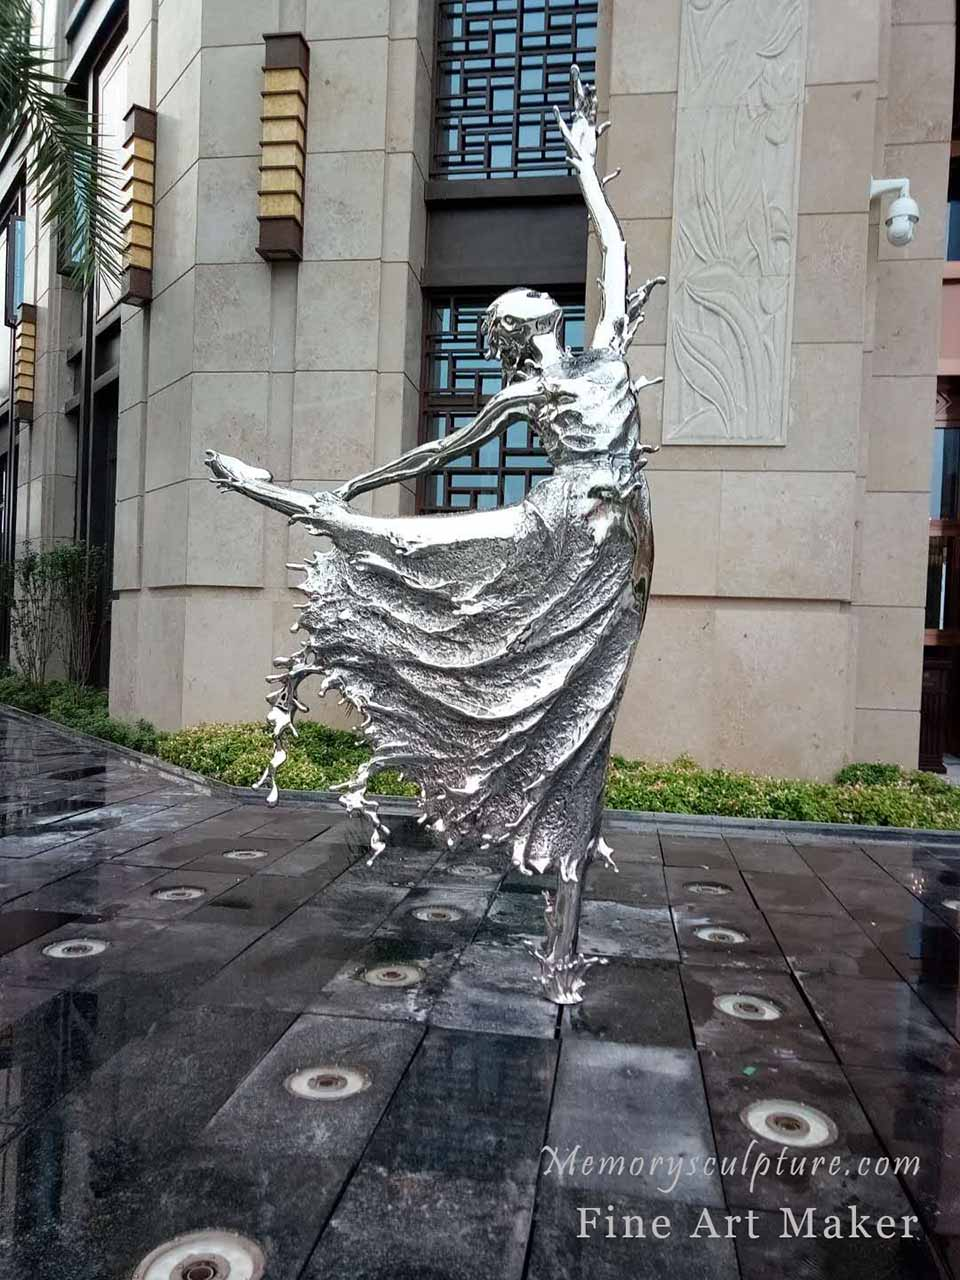 Stainless Steel Sculpture Fine Art Fabrication